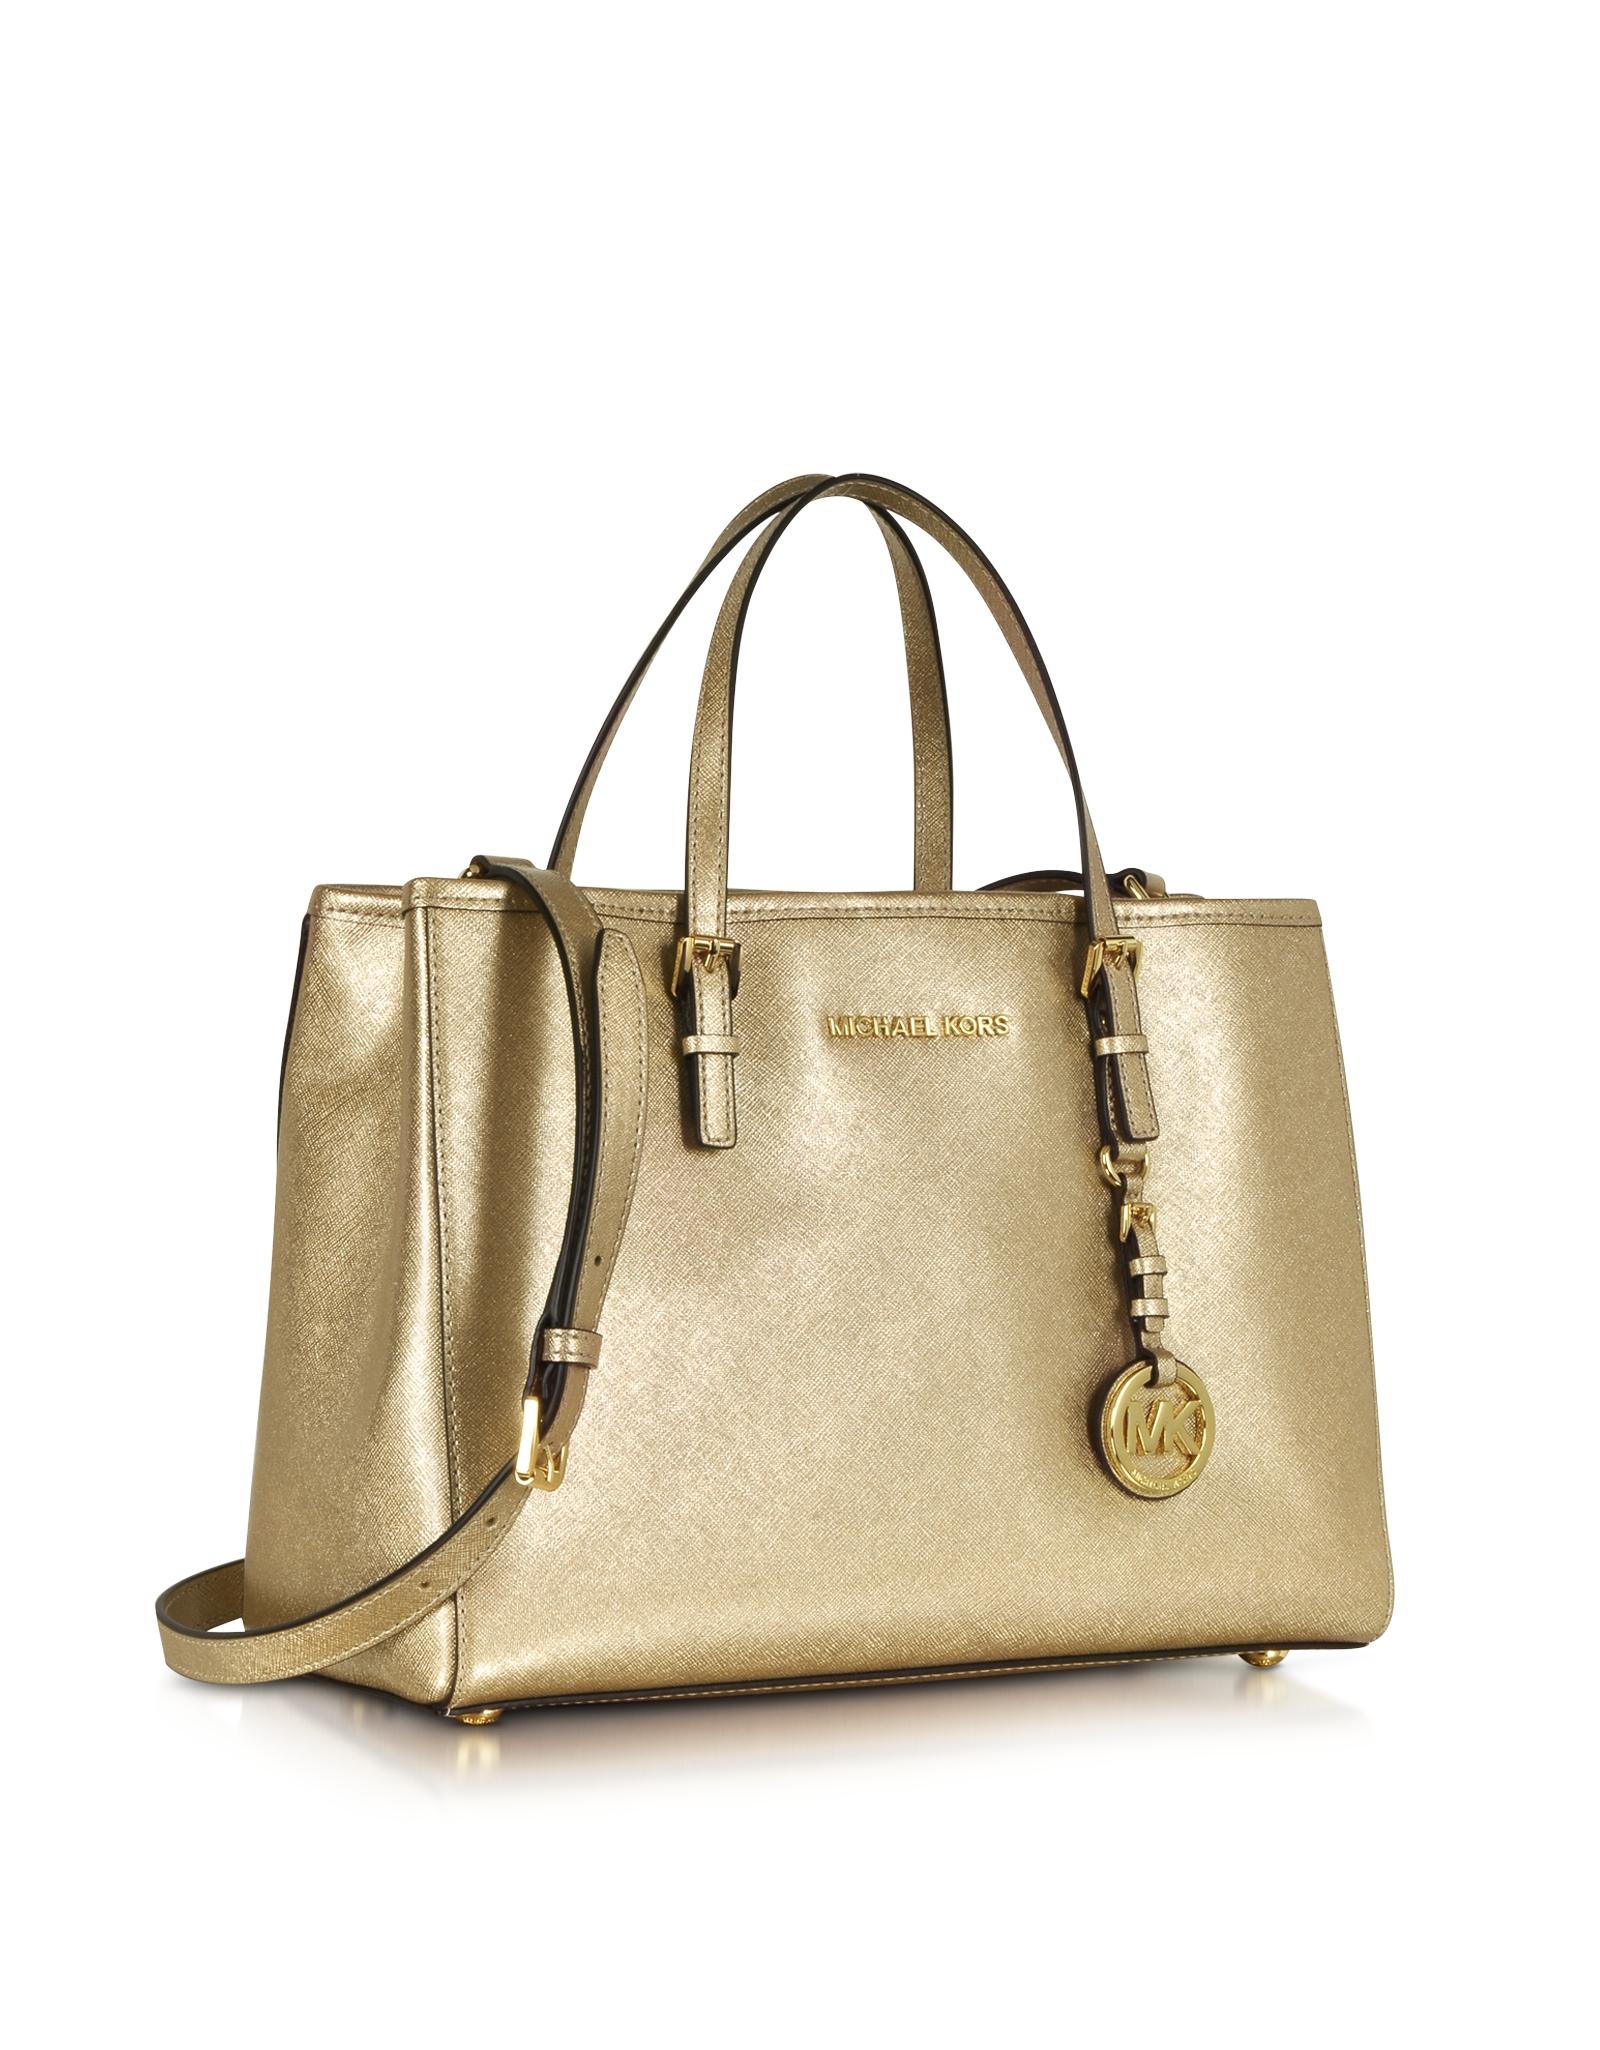 df008fa9ab26 Michael Kors Jet Set Travel Pale Gold Metallic Saffiano Leather ...